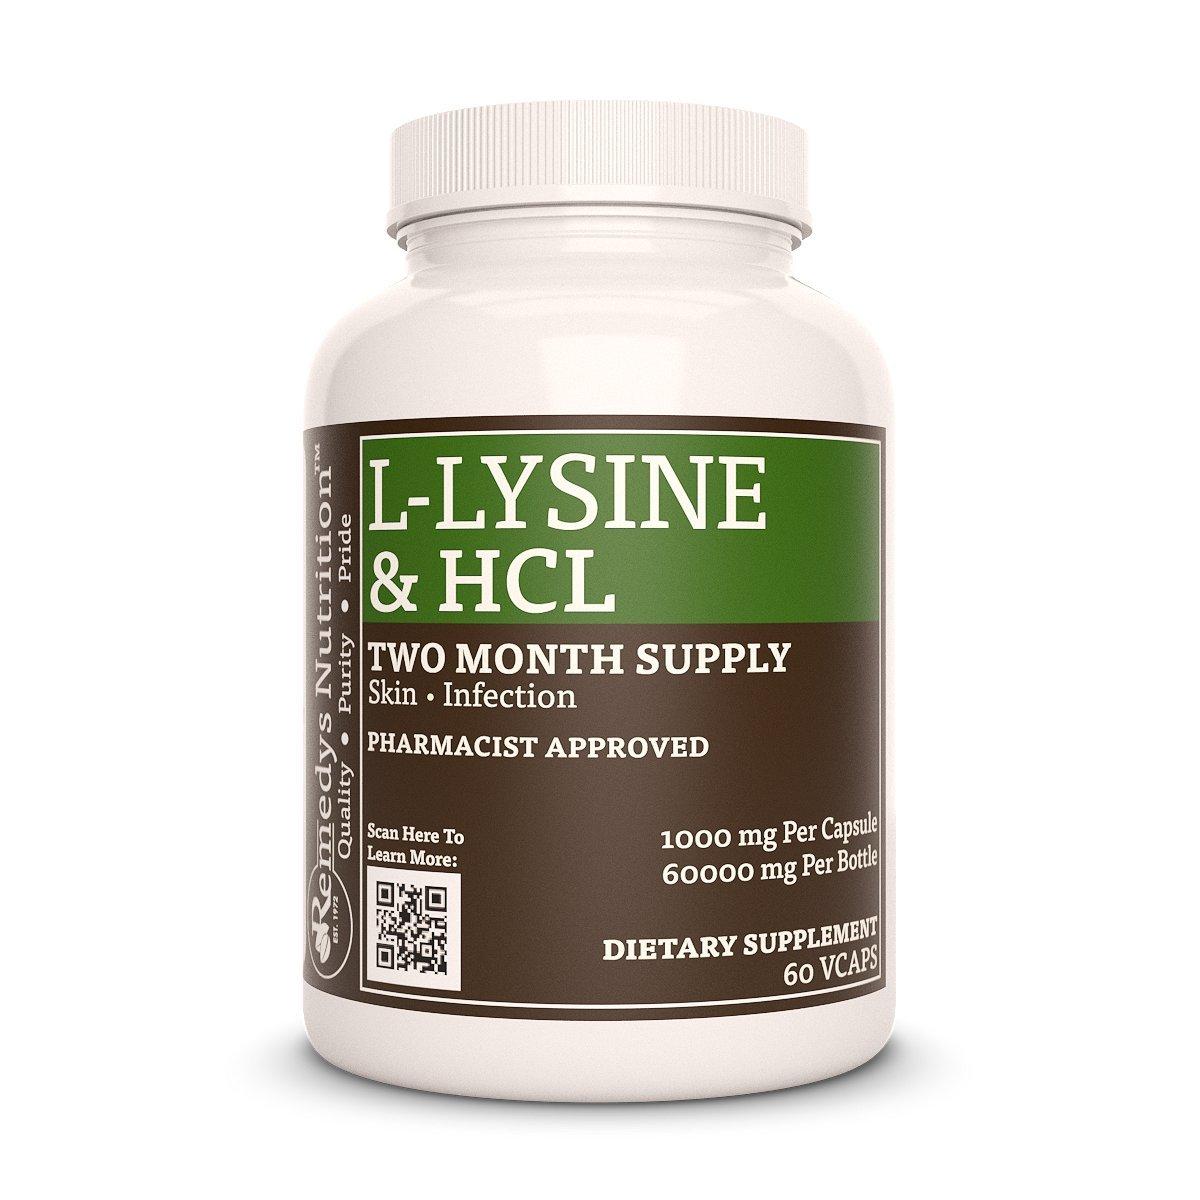 L-Lysine HCL Remedys Nutrition MEGA STRENGTH Vegan 1000 mg per capsule/ 2000 mg daily/ 60.000 mg per bottle vcap